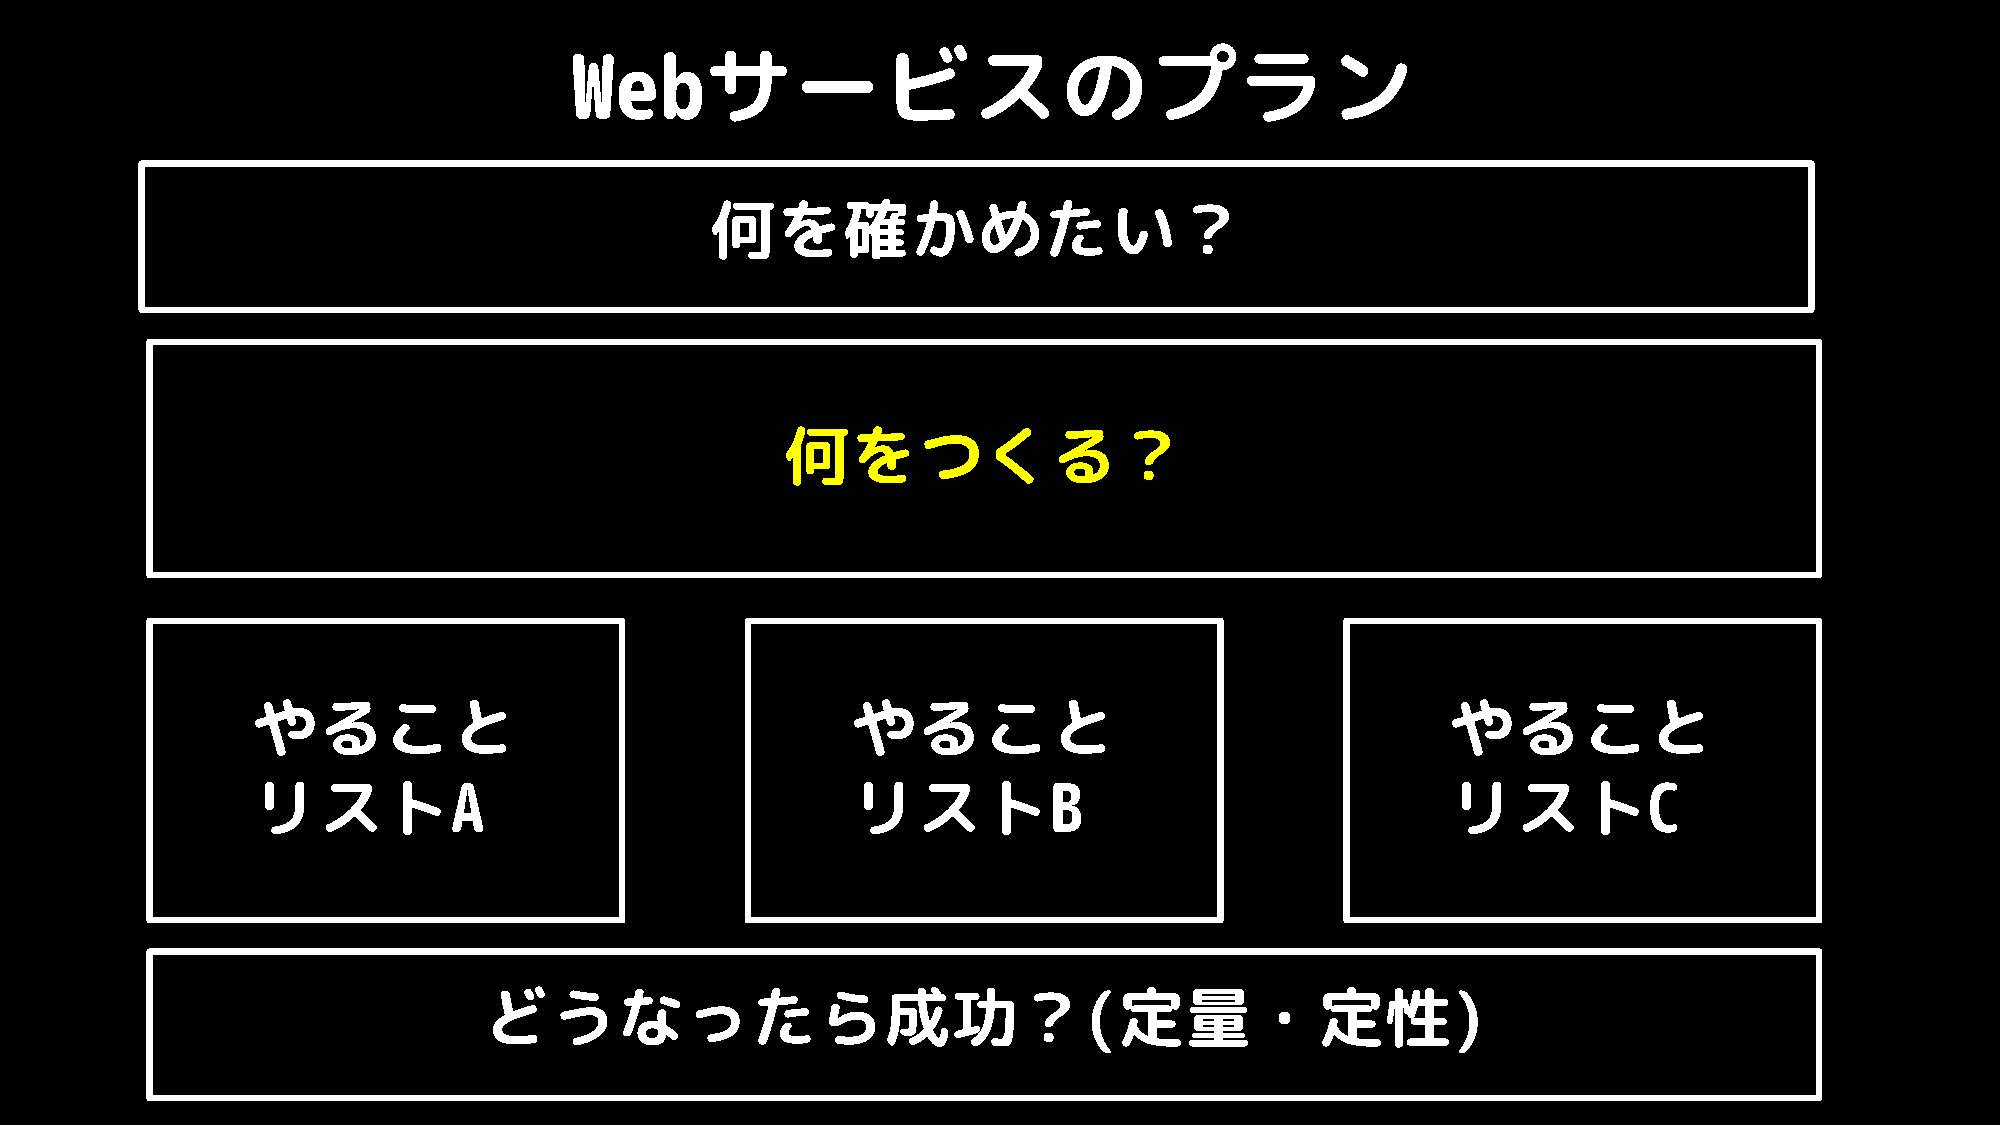 web-160911152159_%e3%83%9a%e3%83%bc%e3%82%b8_48